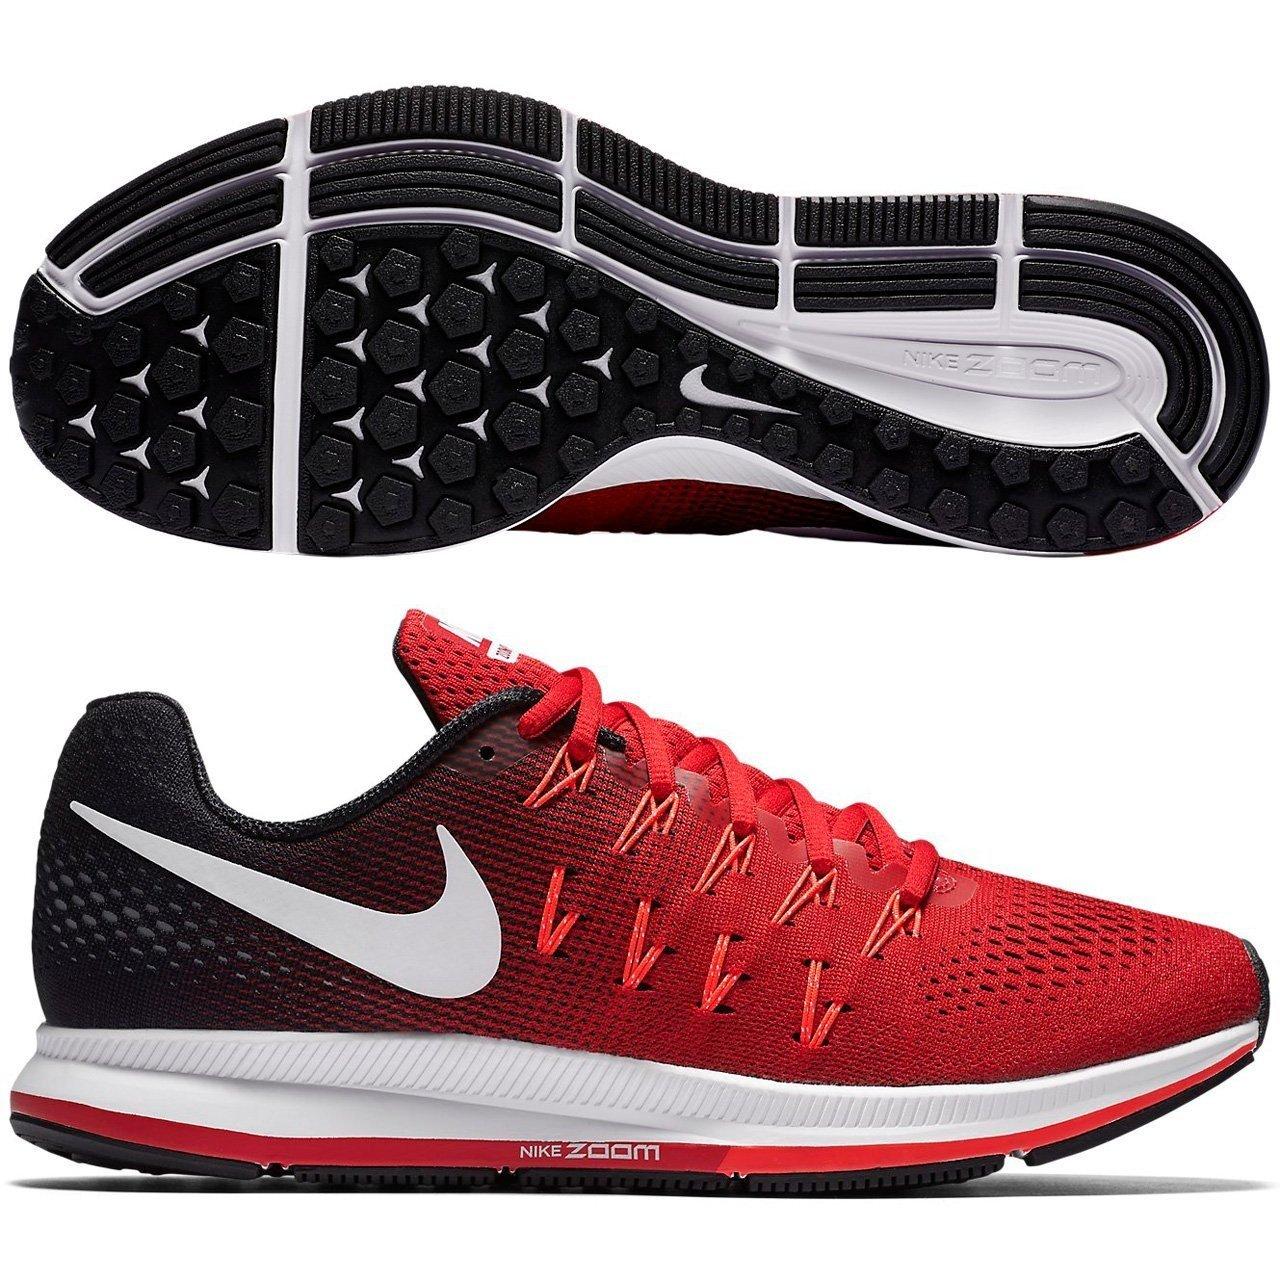 Nike Men's Air Zoom Pegasus 33, University Red/White/Black - 9 D(M) US